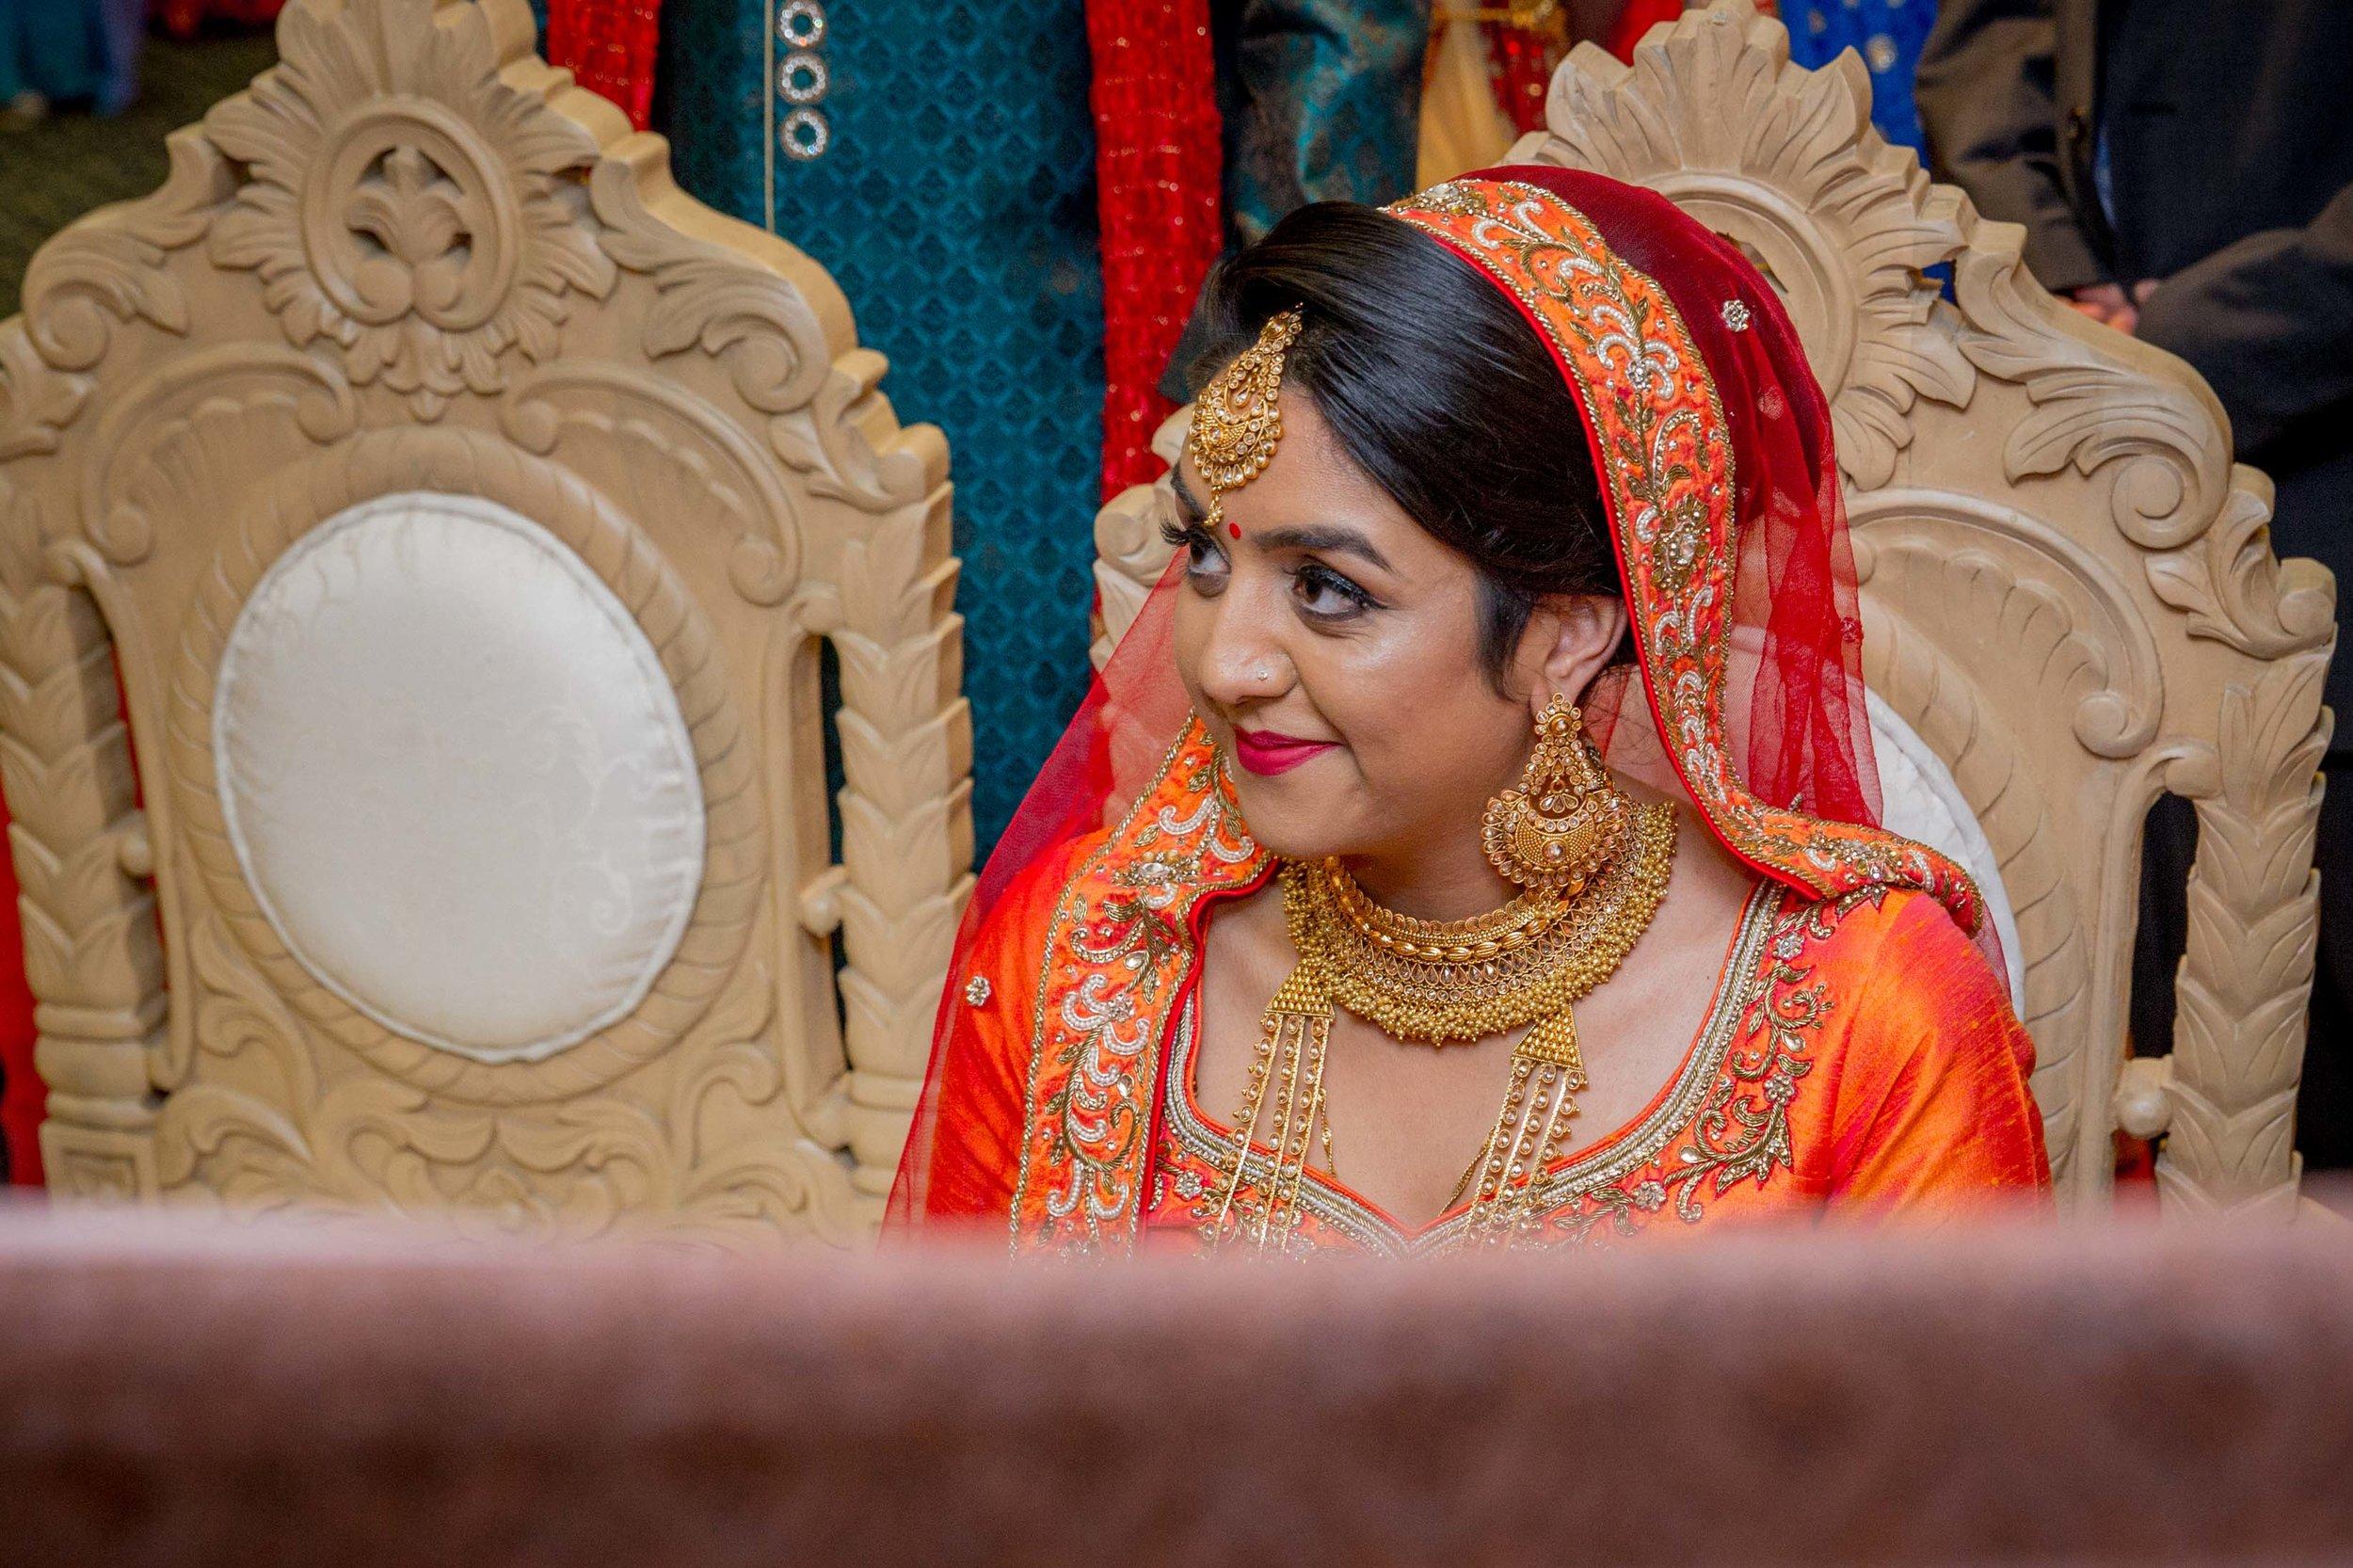 premier-banquetting-london-Hindu-asian-wedding-photographer-natalia-smith-photography-17.jpg